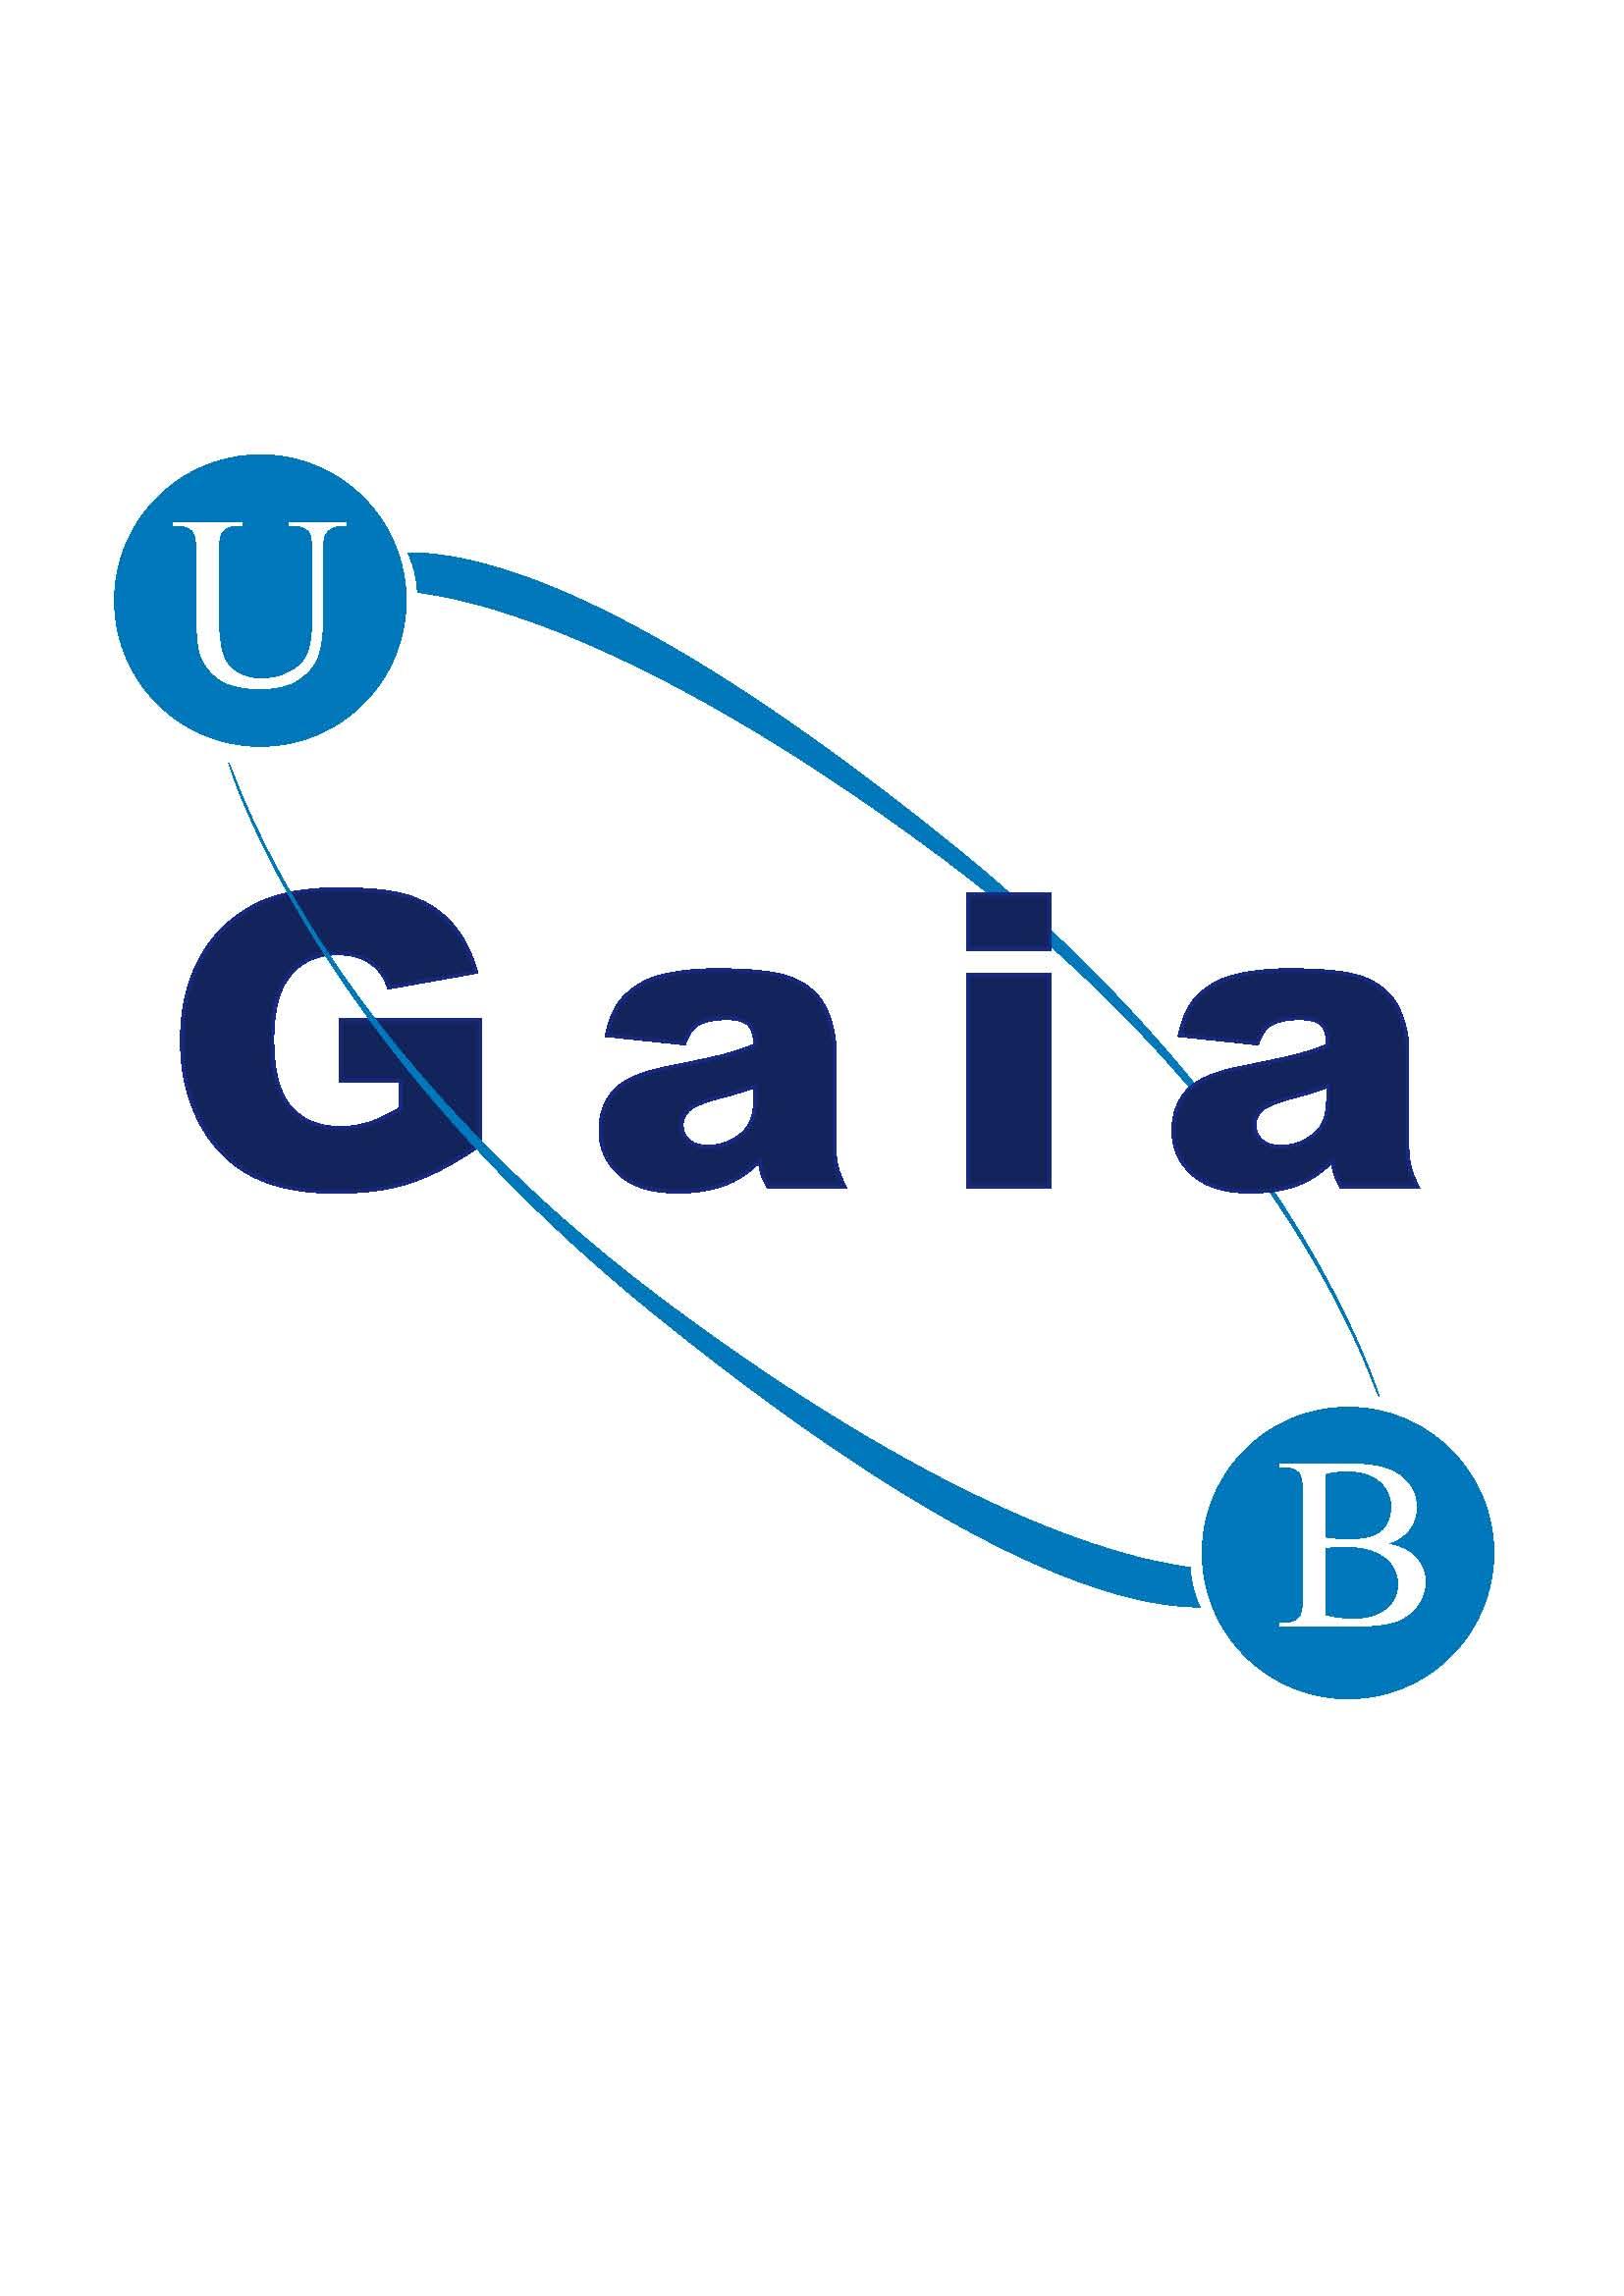 LogoGaiaUB-2.jpg